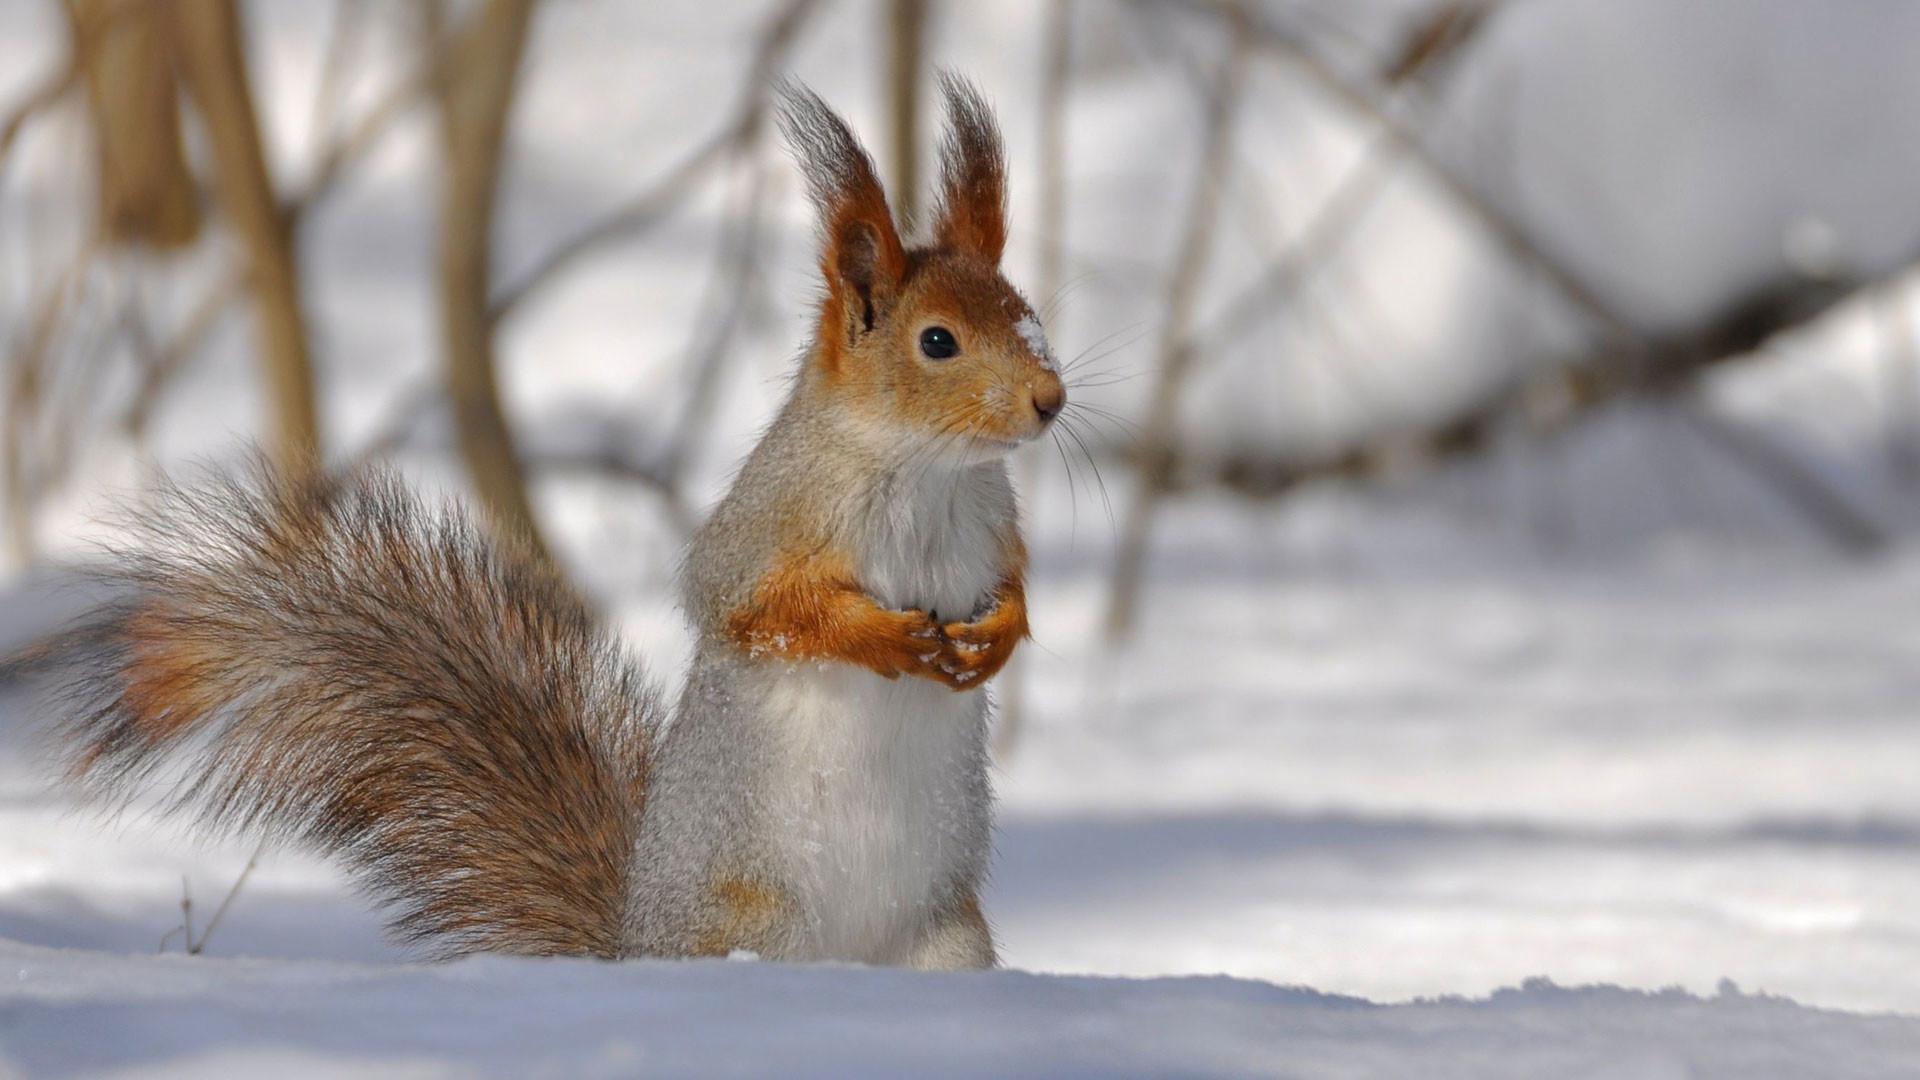 HD Cute Winter Animal Wallpaper, Live Winter Animal Wallpapers .